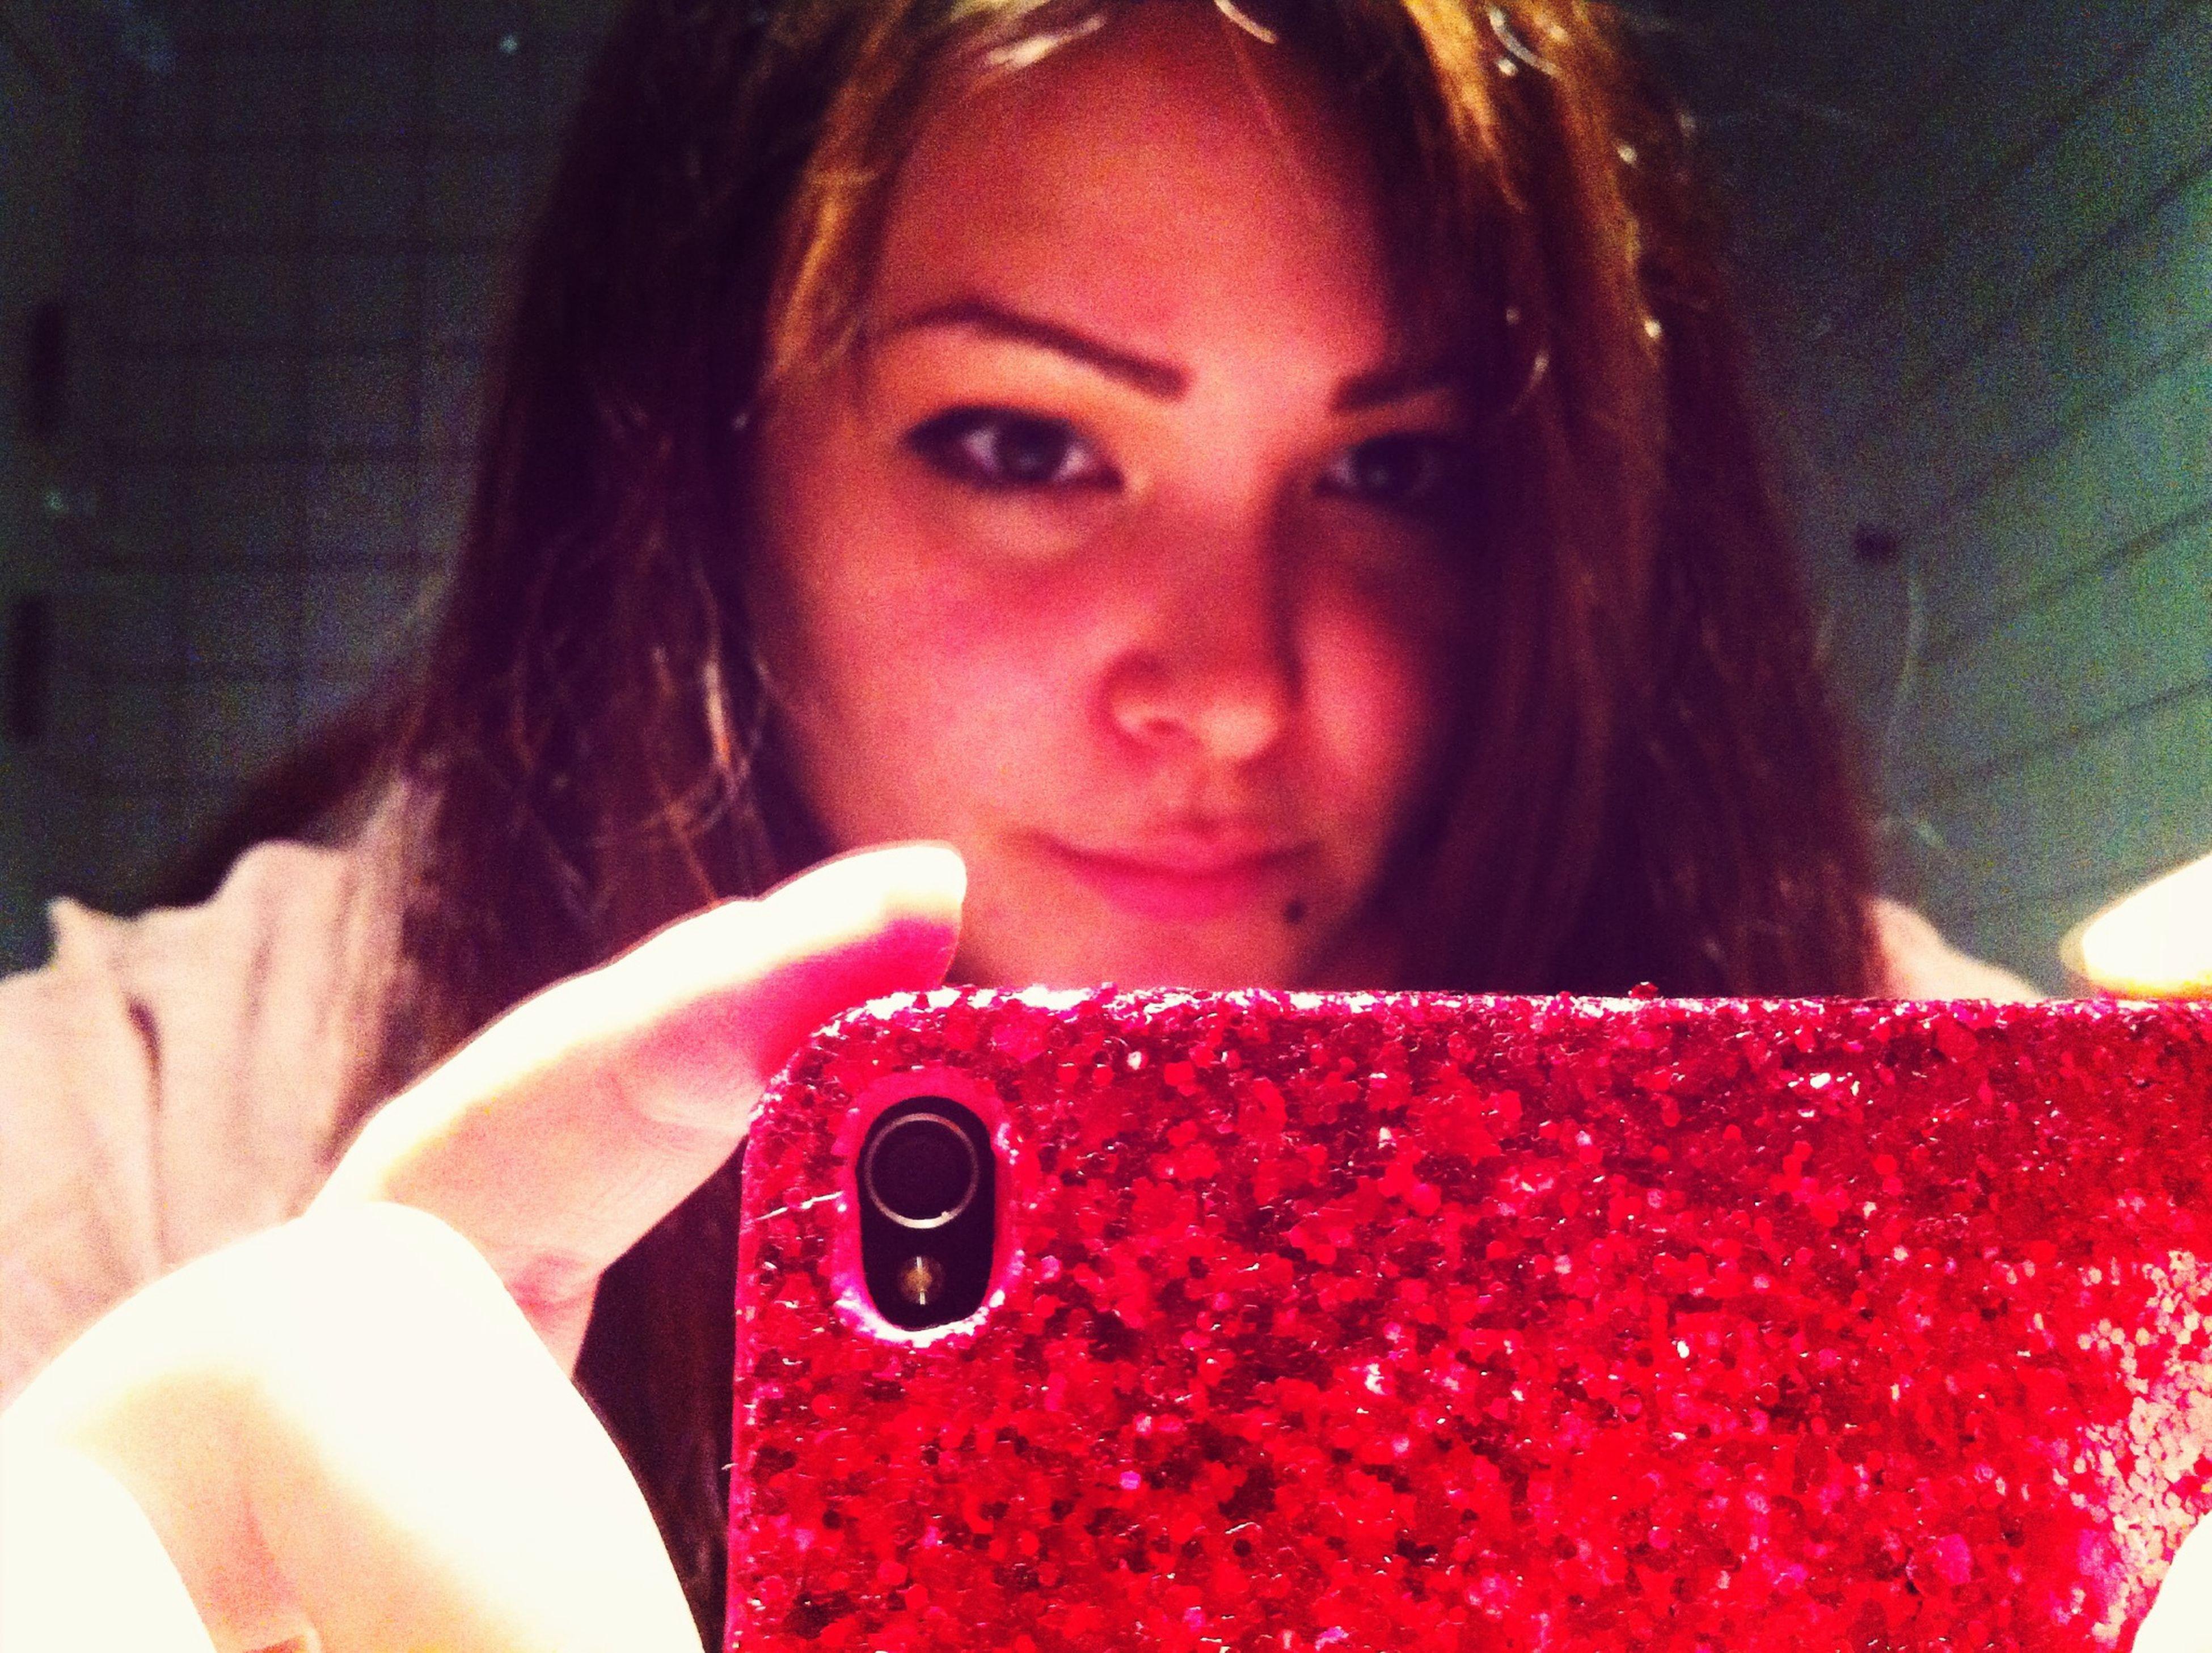 Dressing room at work ? Selfie Classy Lady Classy IPhone Copenhagen Sas Sas Lounge Me Myself Copenhagen Airport